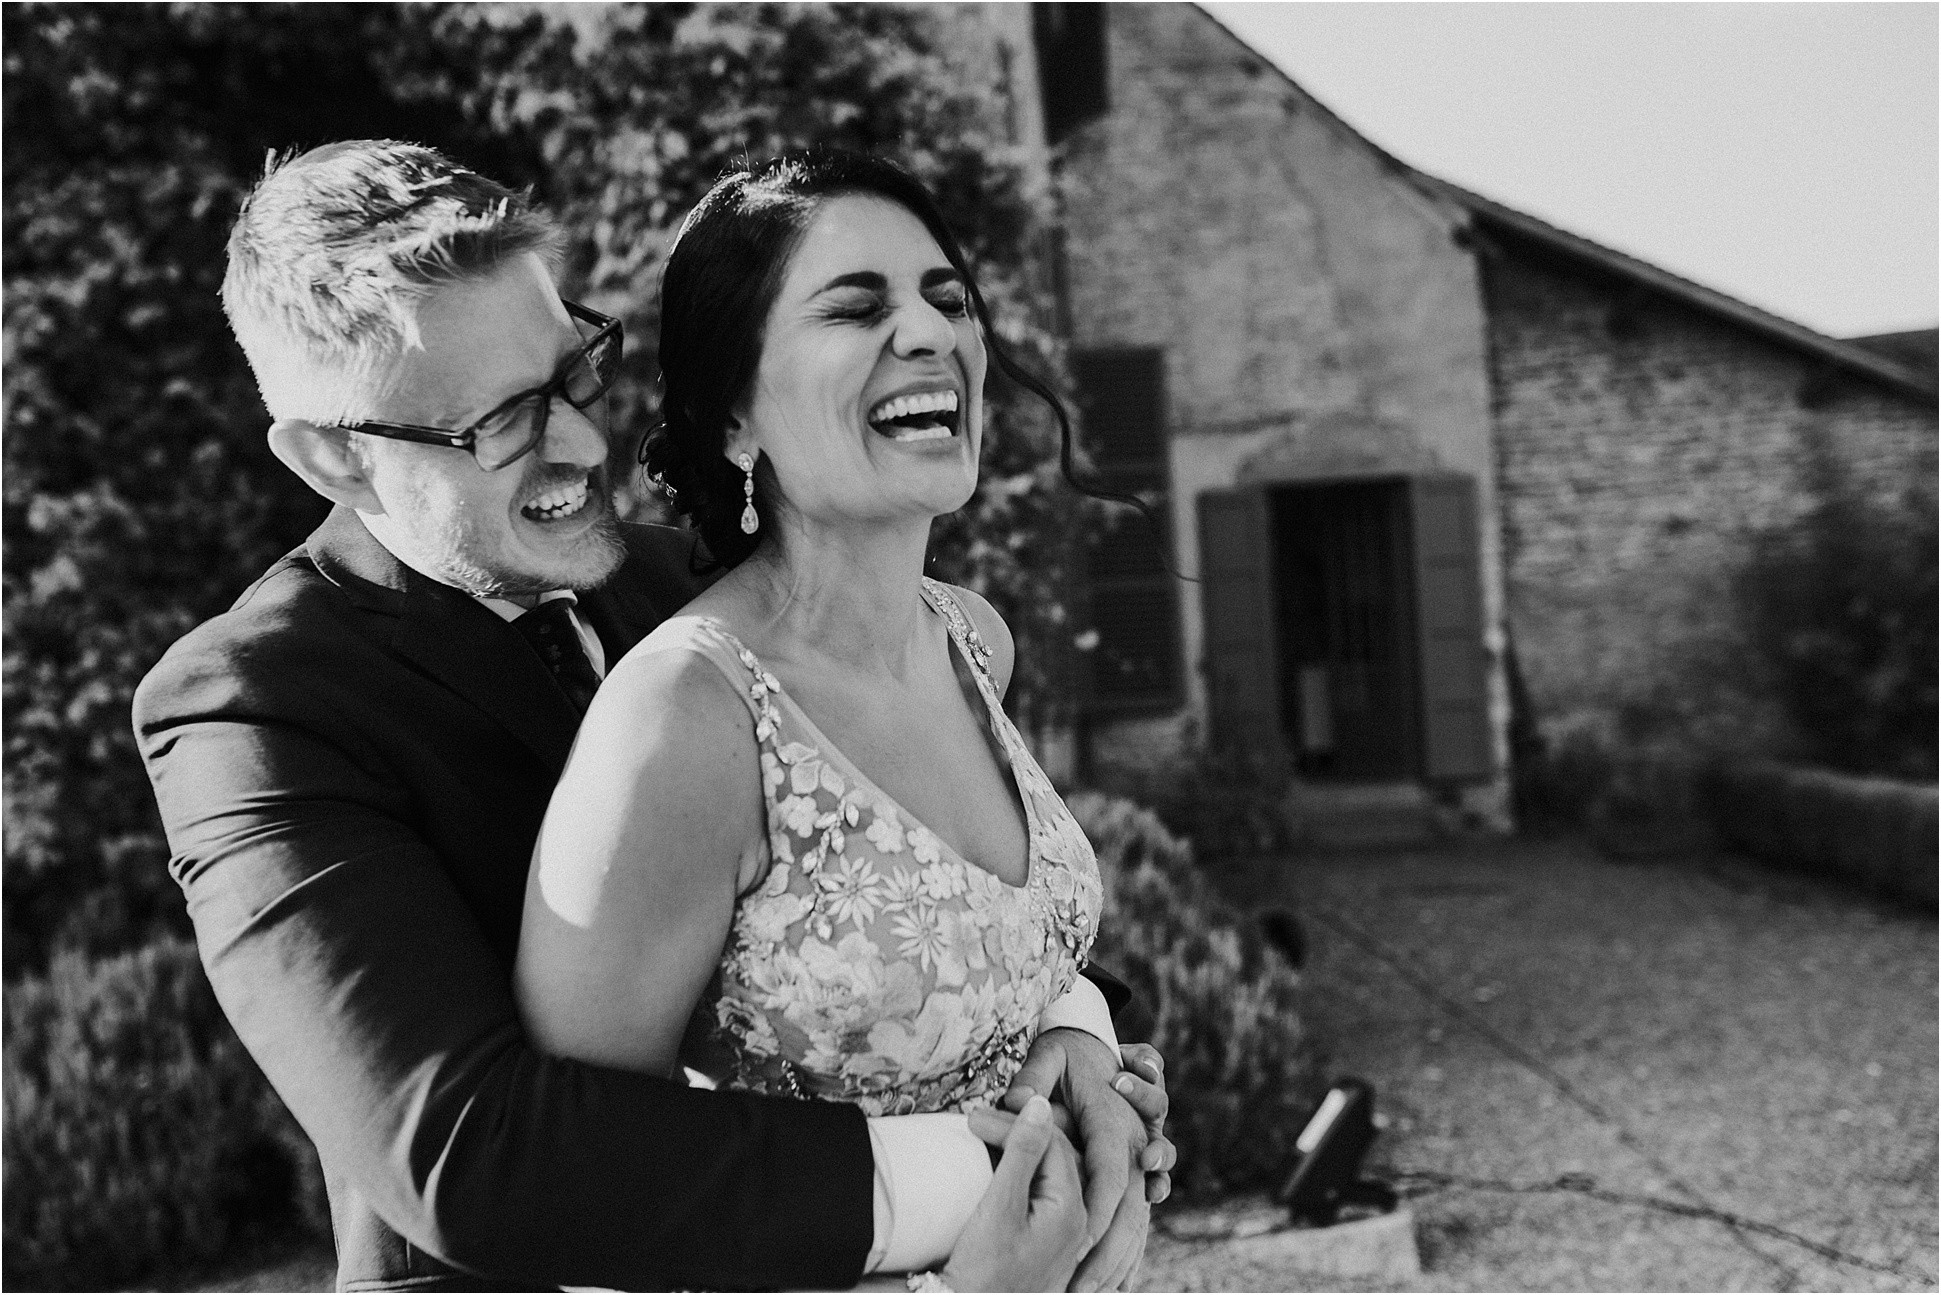 Kateryna-photos-photographe-mariage-chateau-st-paterne-mayenne-normandie_0185.jpg